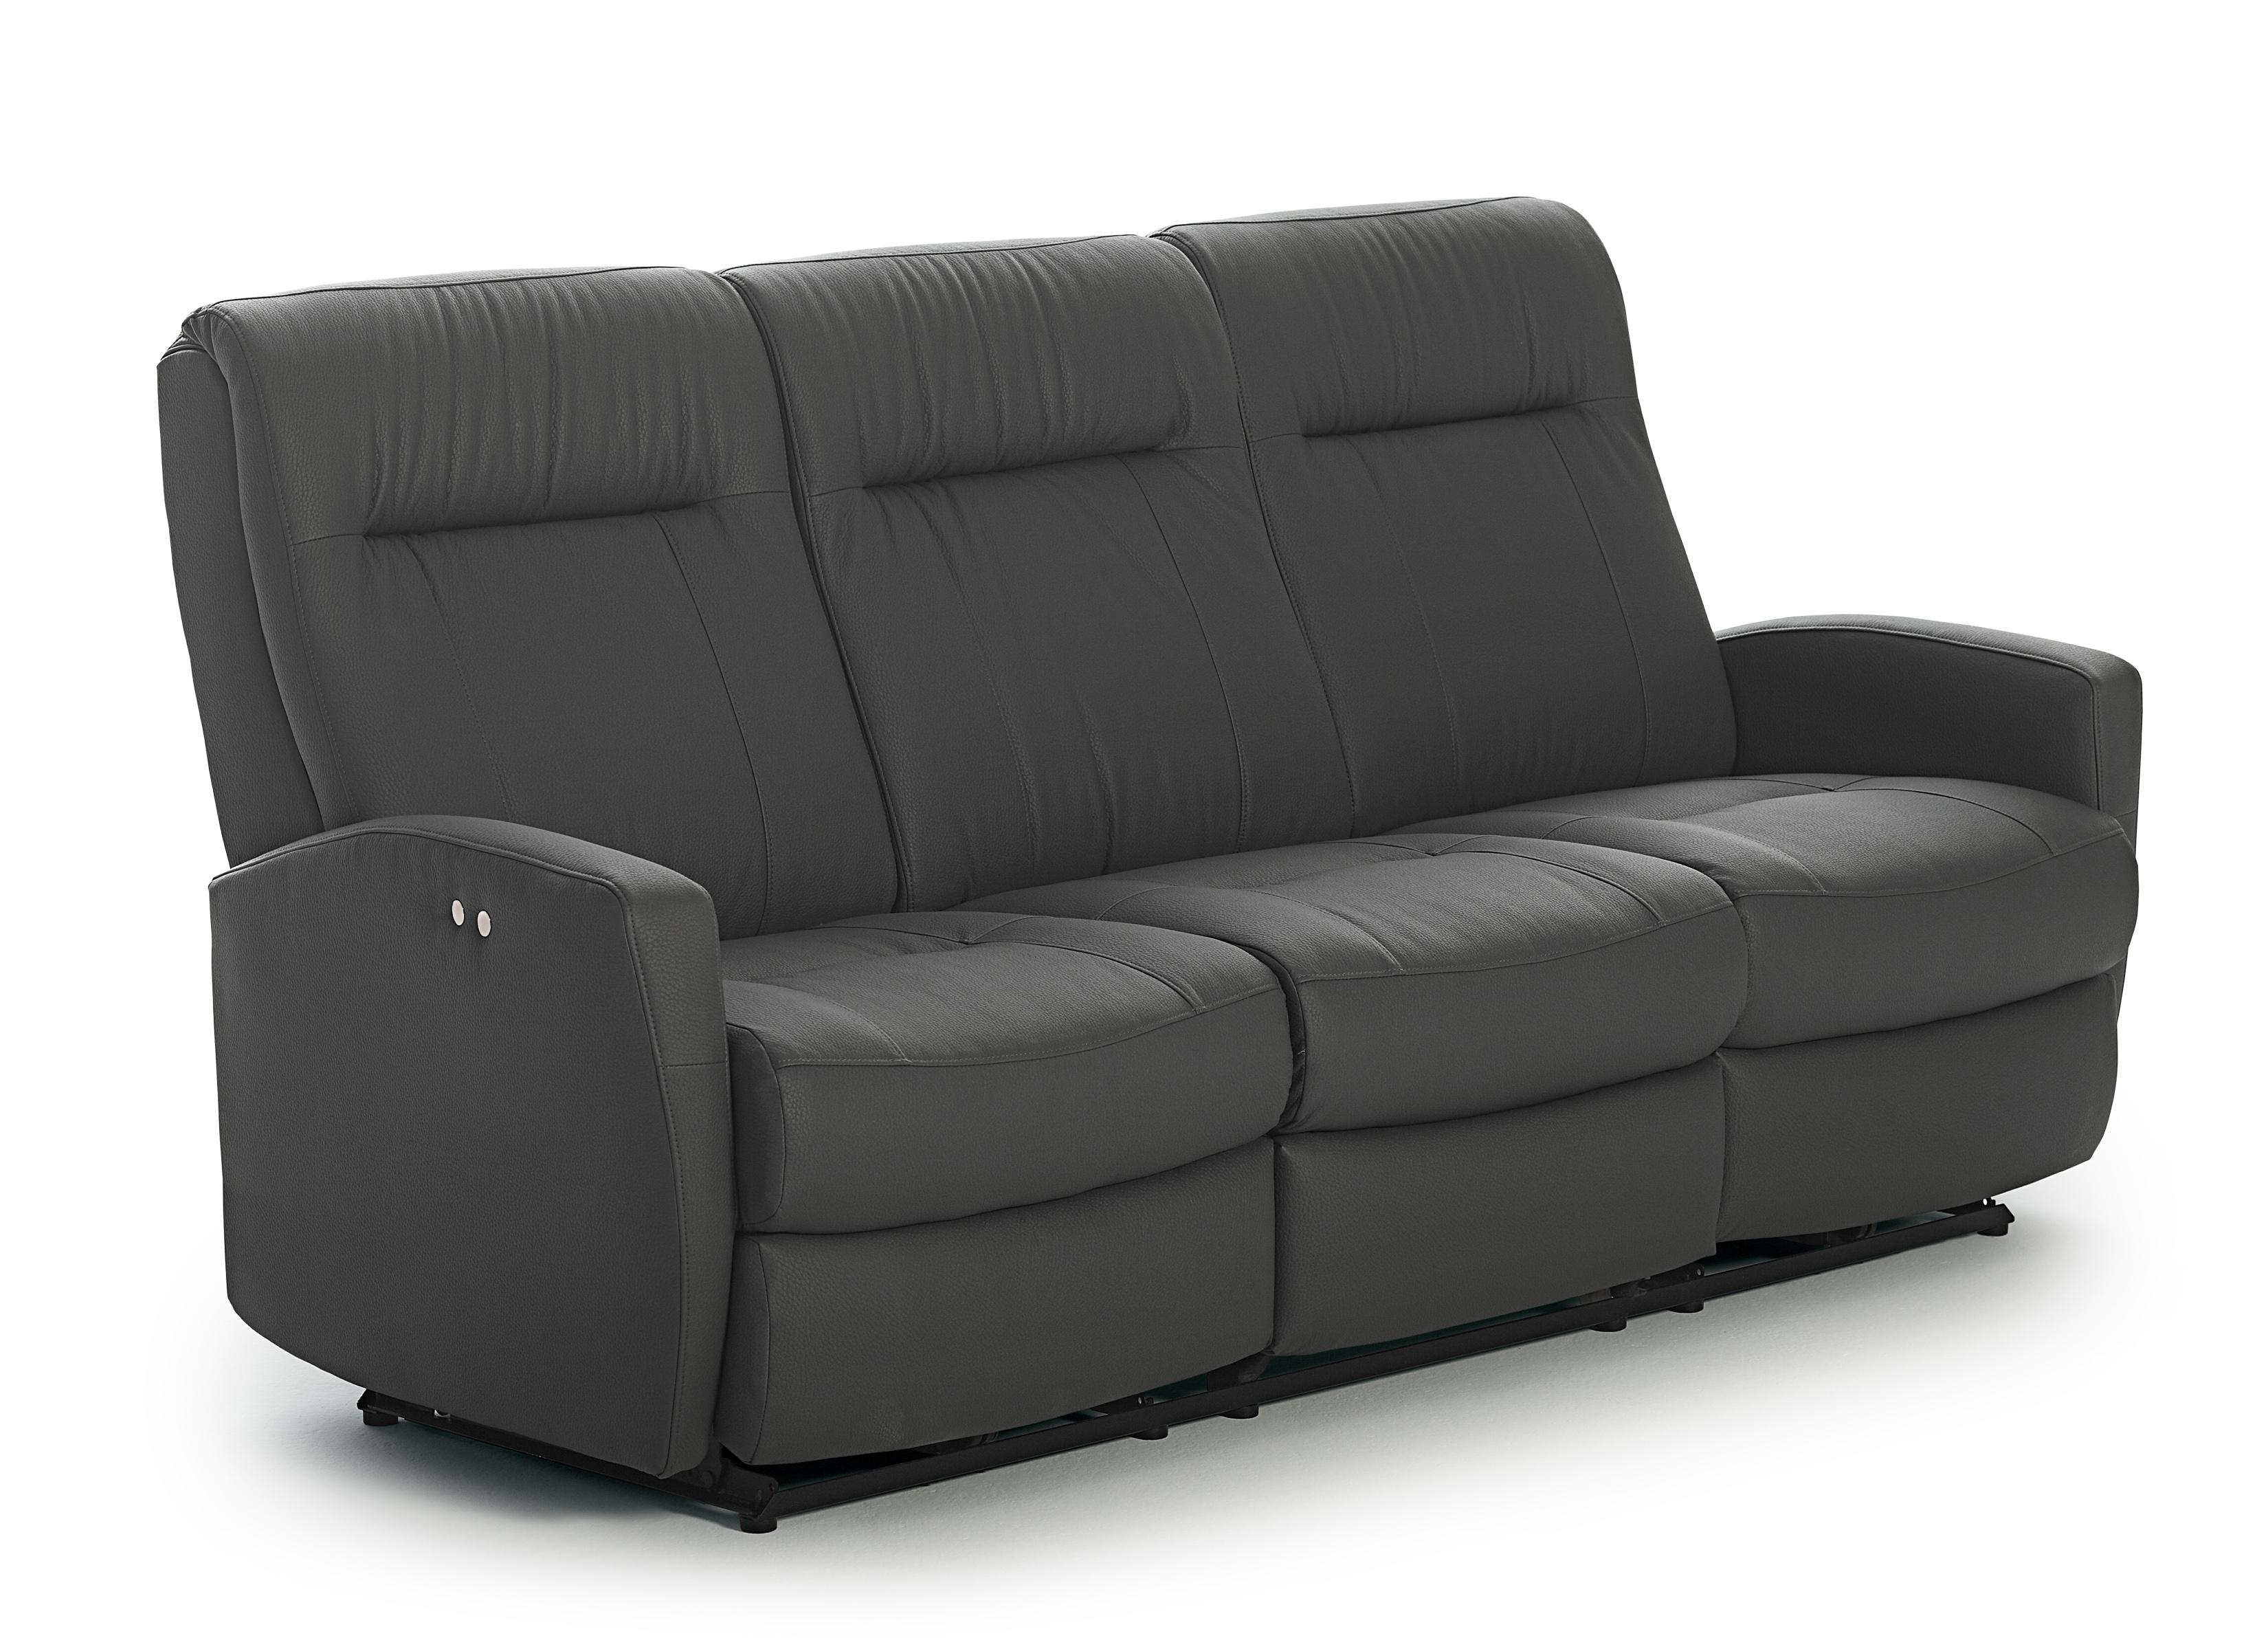 Costilla Power Tilt Headrest Space Saver Sofa by Best Home Furnishings at Best Home Furnishings